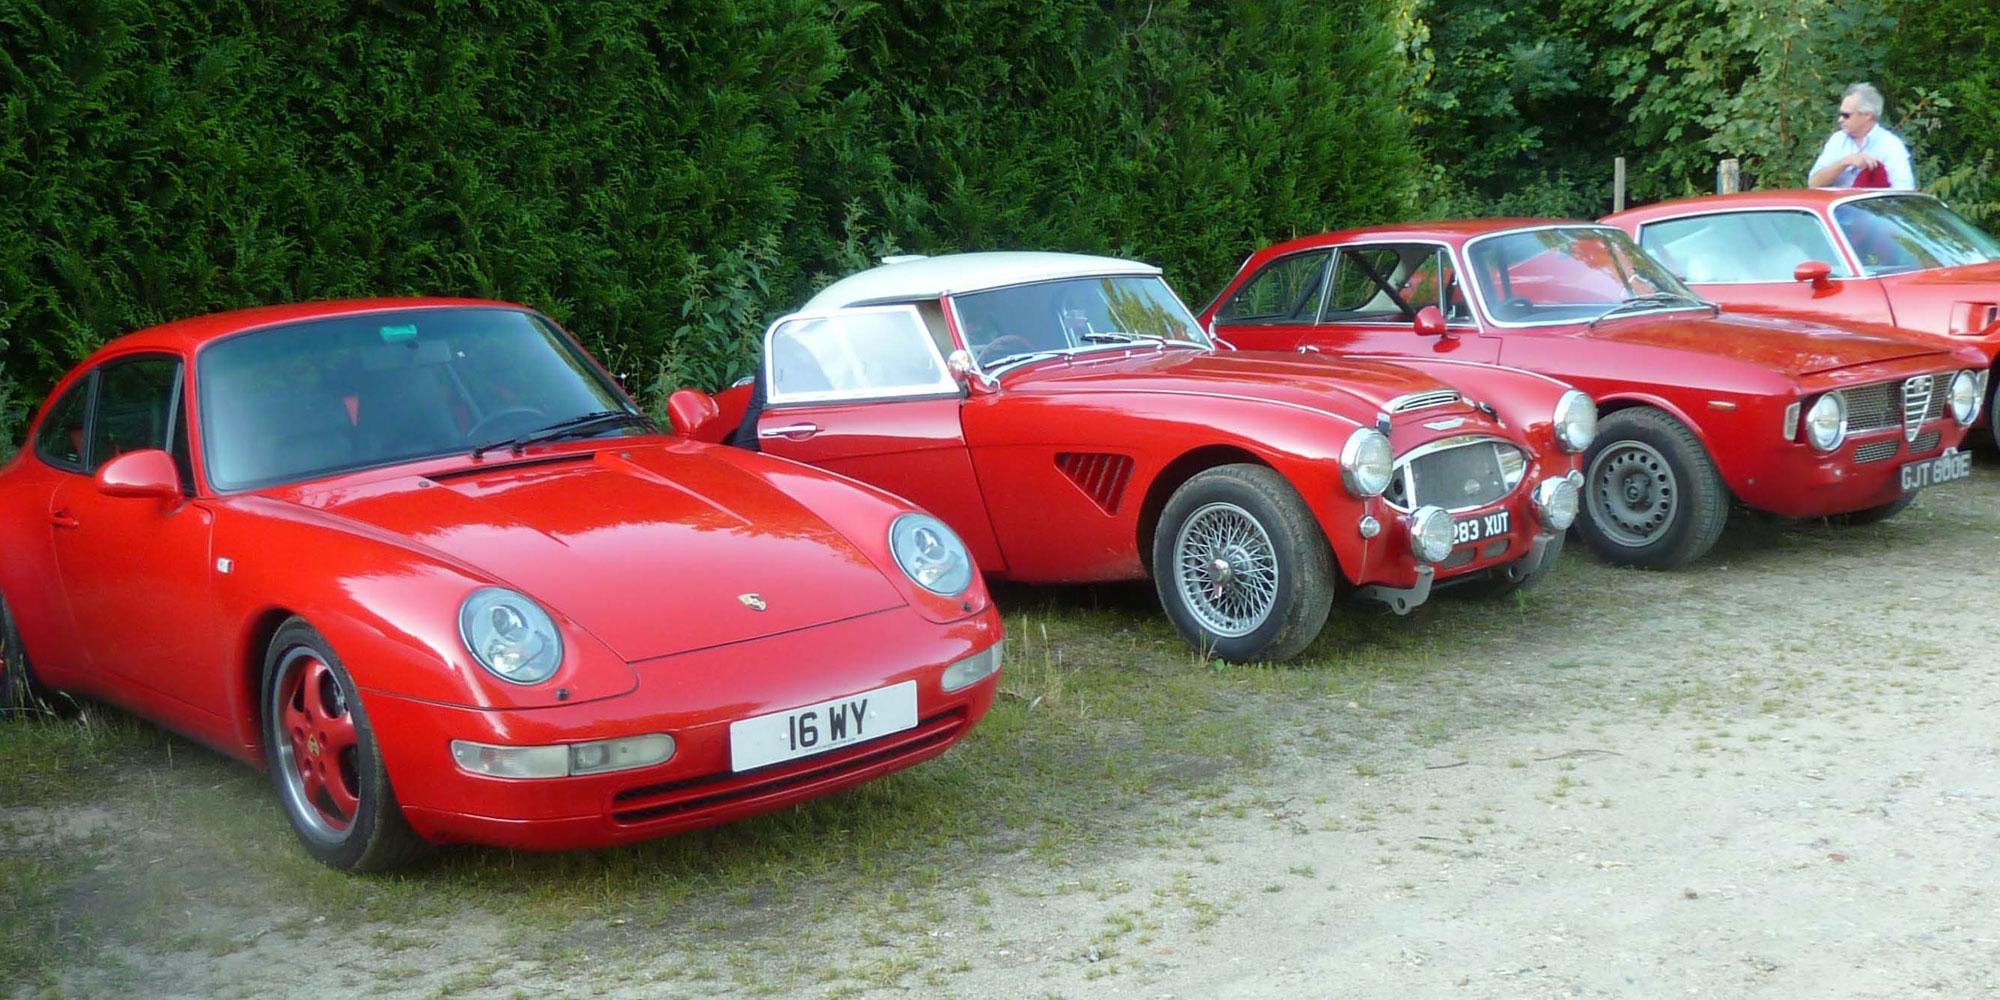 Show your Porsche